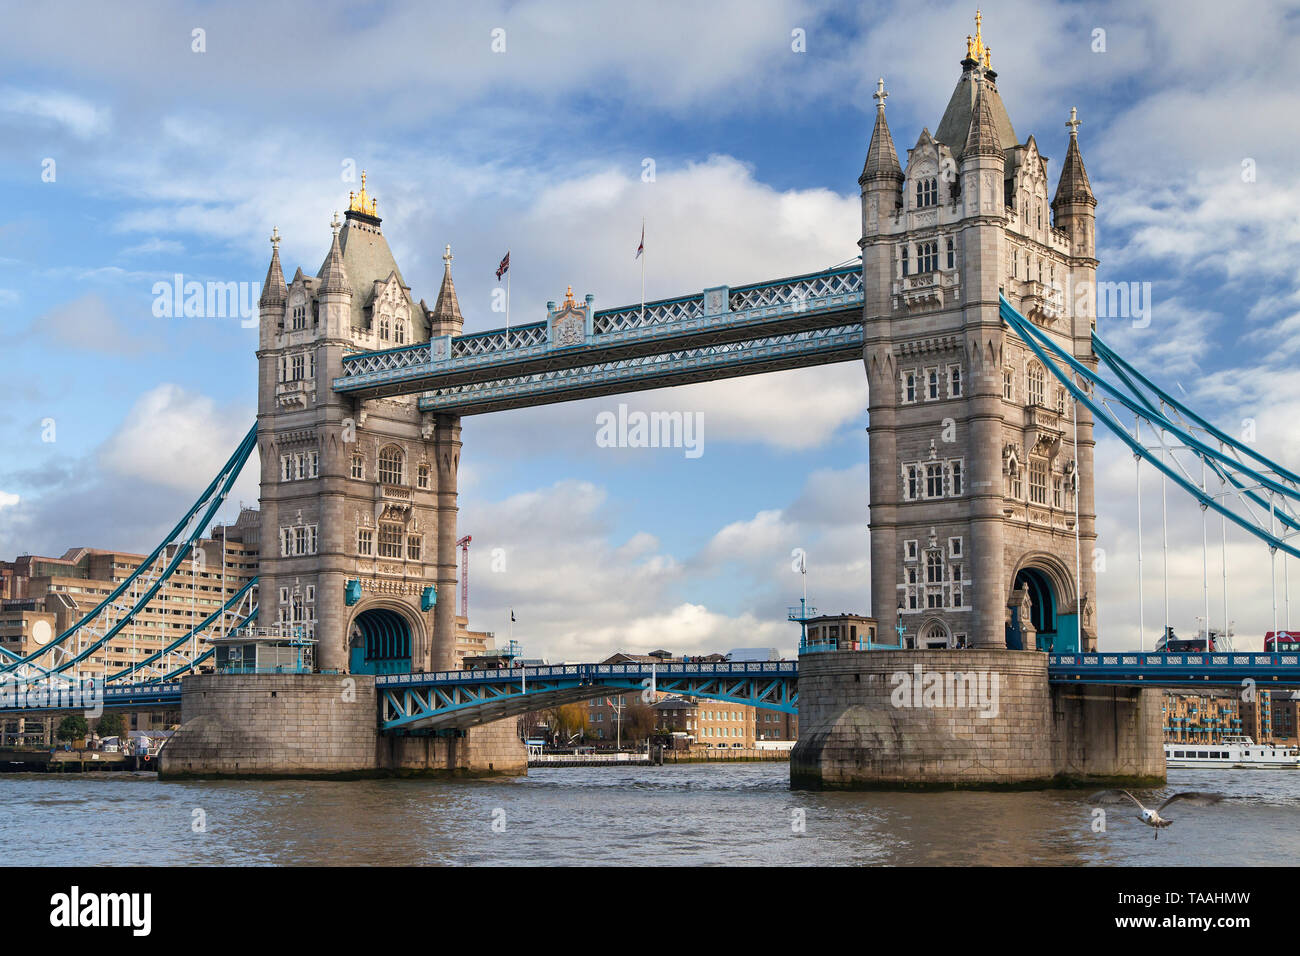 The Tower Bridge in London, United Kingdom. Stock Photo